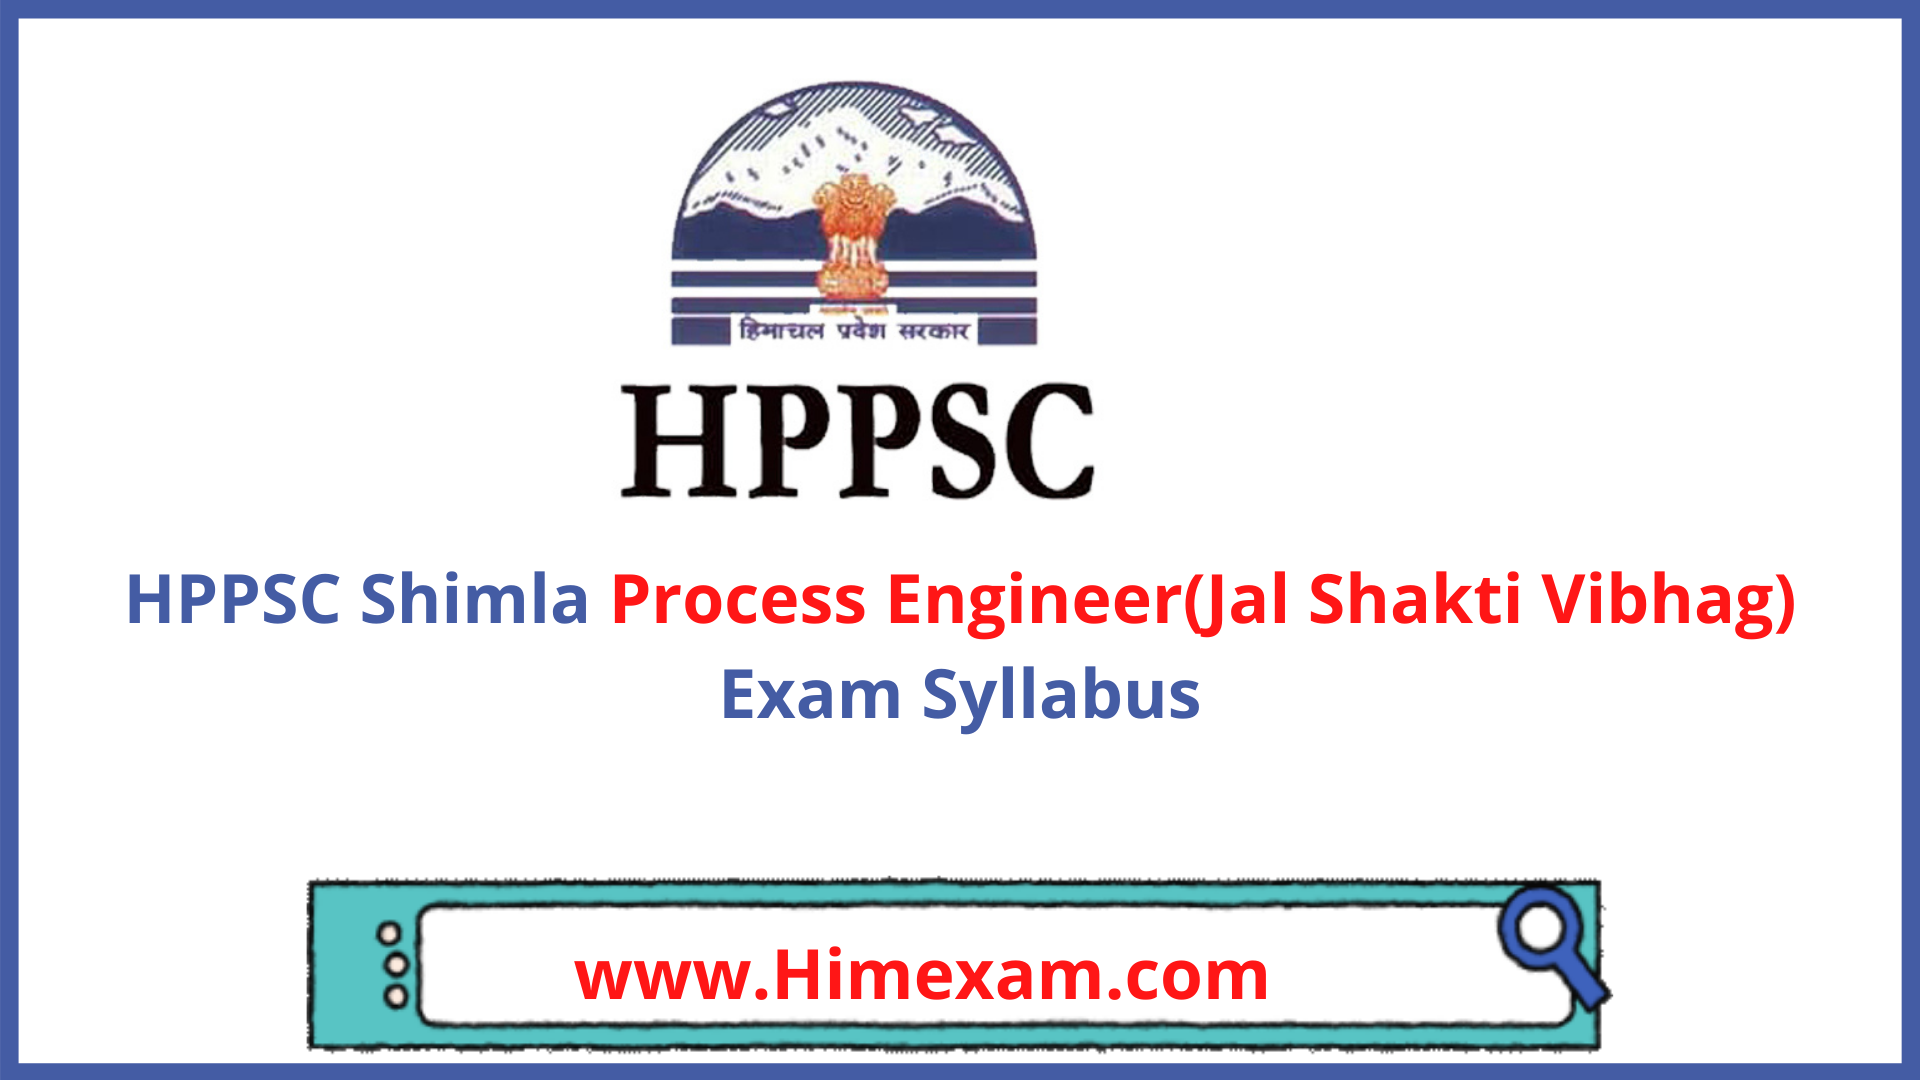 HPPSC Shimla Process Engineer(Jal Shakti Vibhag) Exam Syllabus